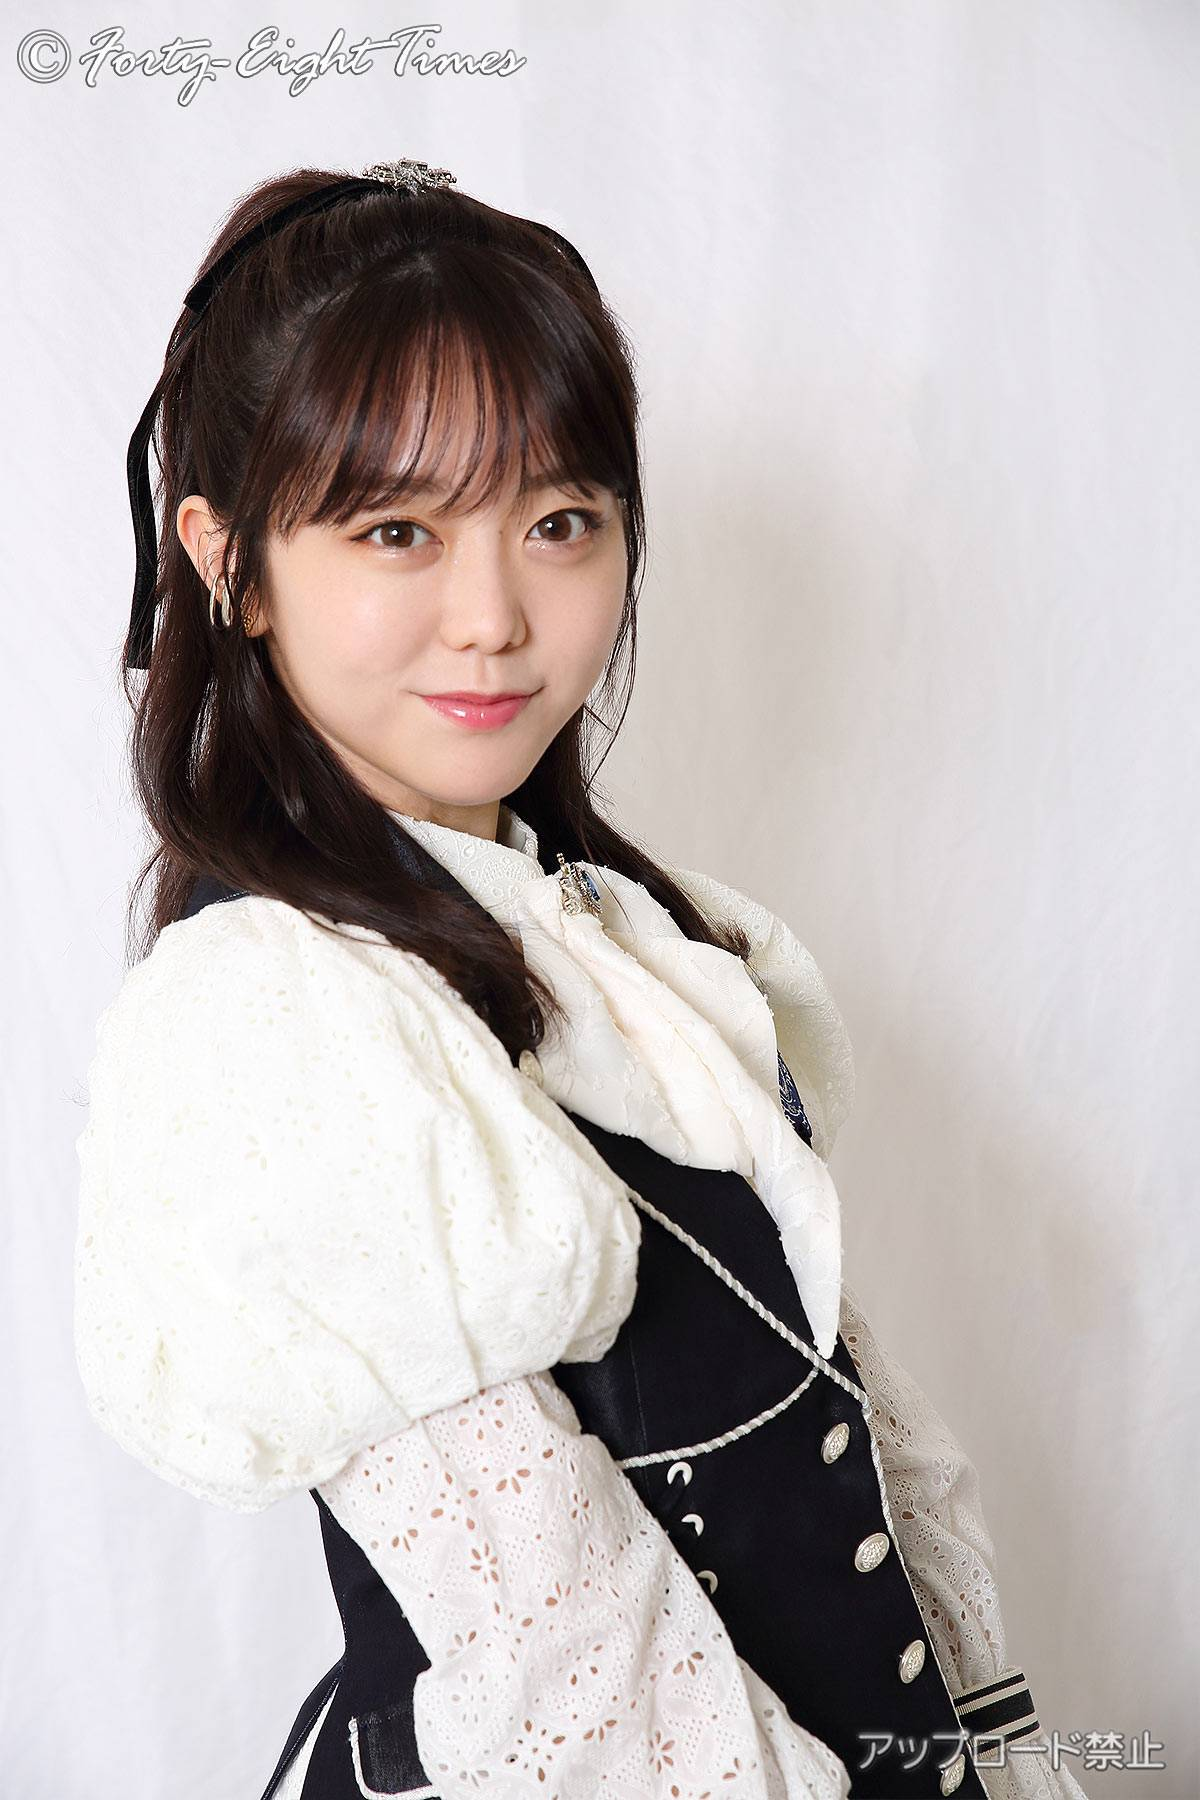 Minegishi Minami 48 Times 2105 02.jpg